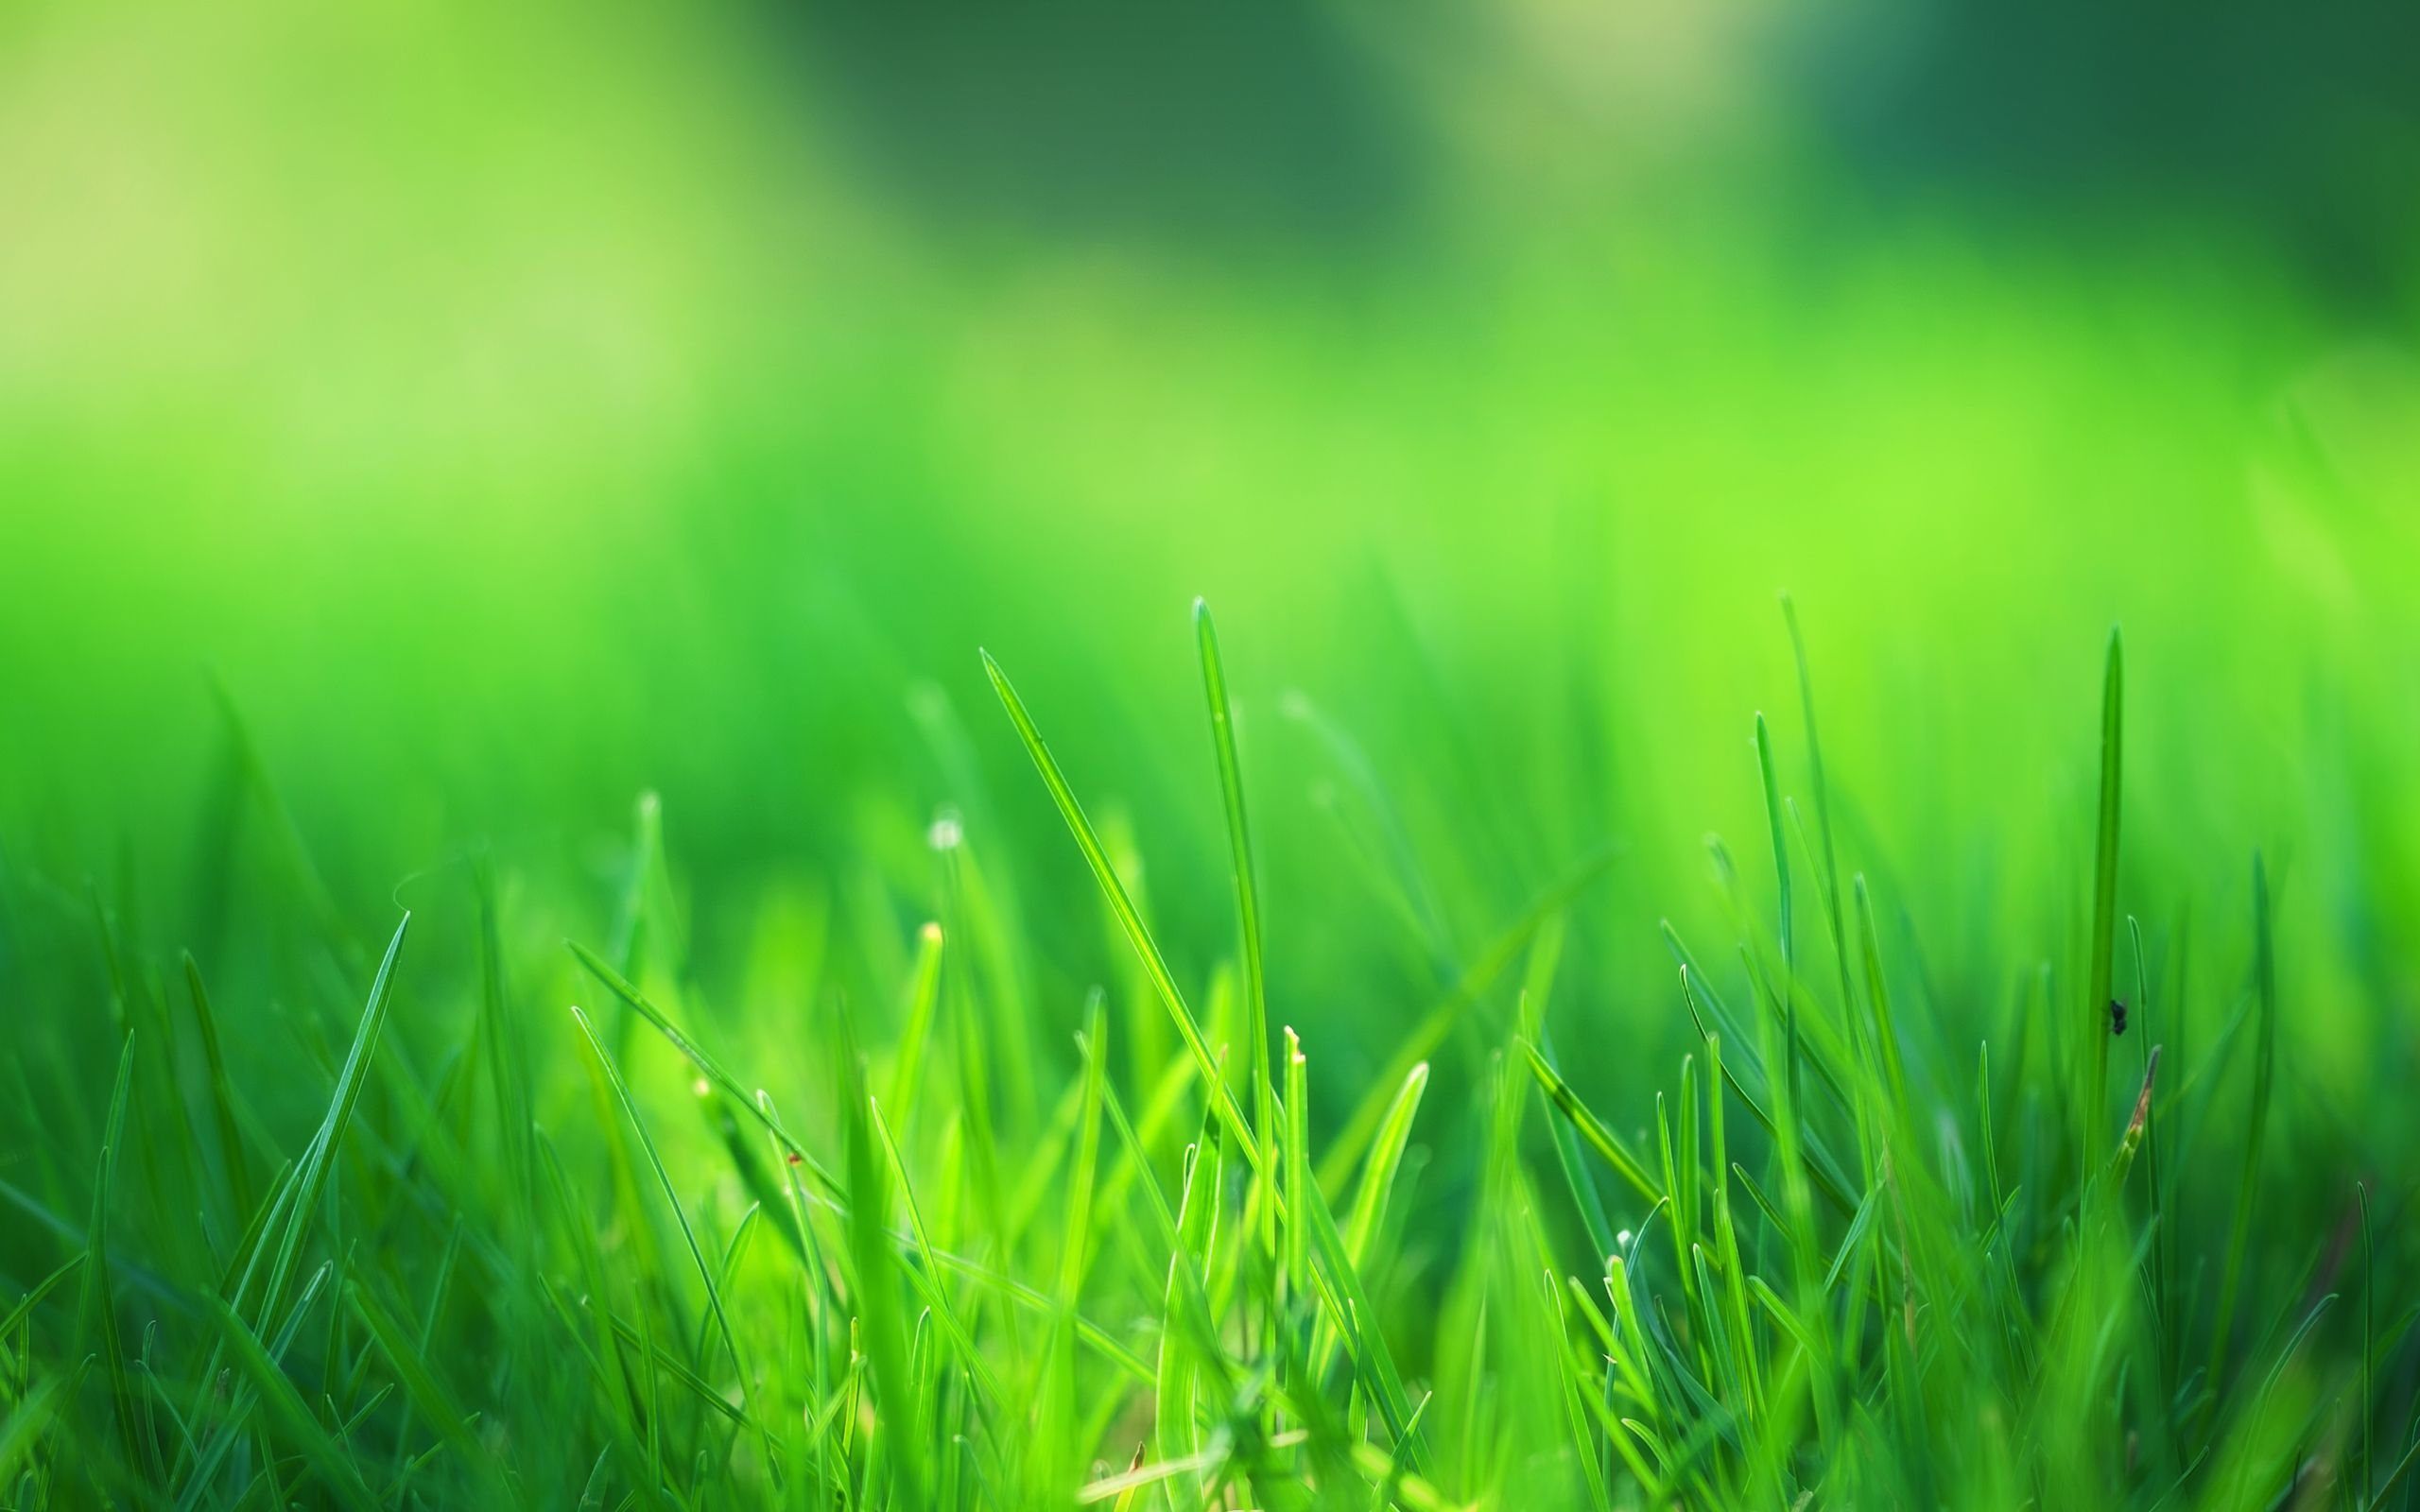 Green Grass Field Wallpapers | HD Wallpapers | Epic Car